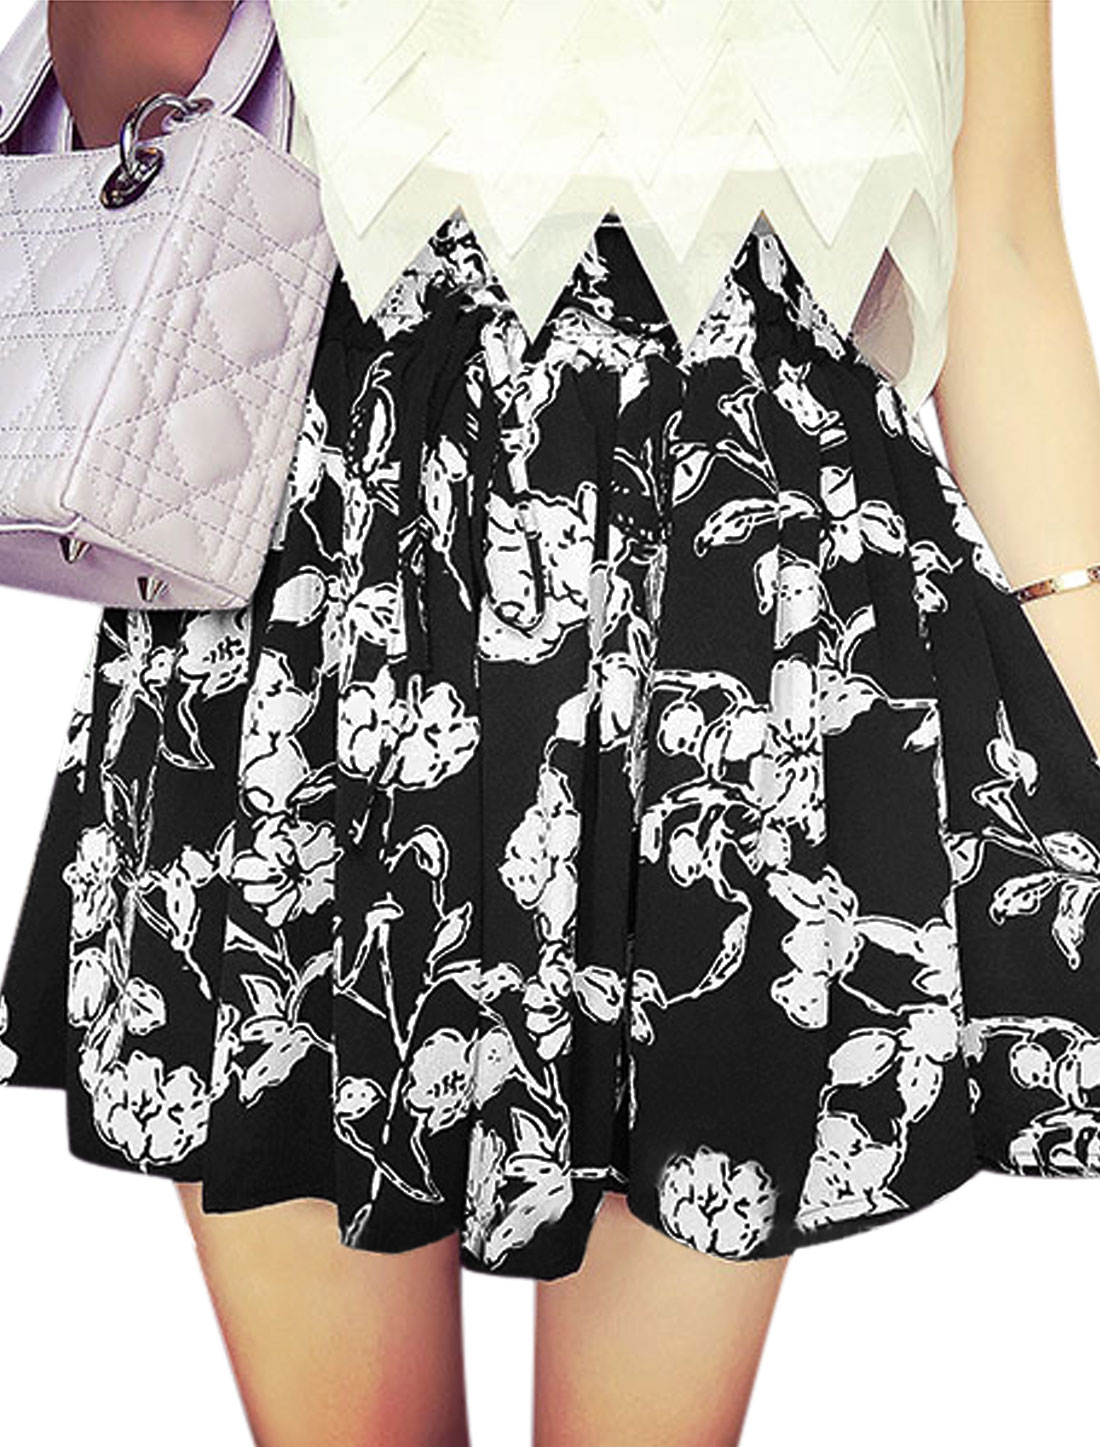 Ladies Mid Rise Elasticized Waist Floral Prints Skorts White Black XS